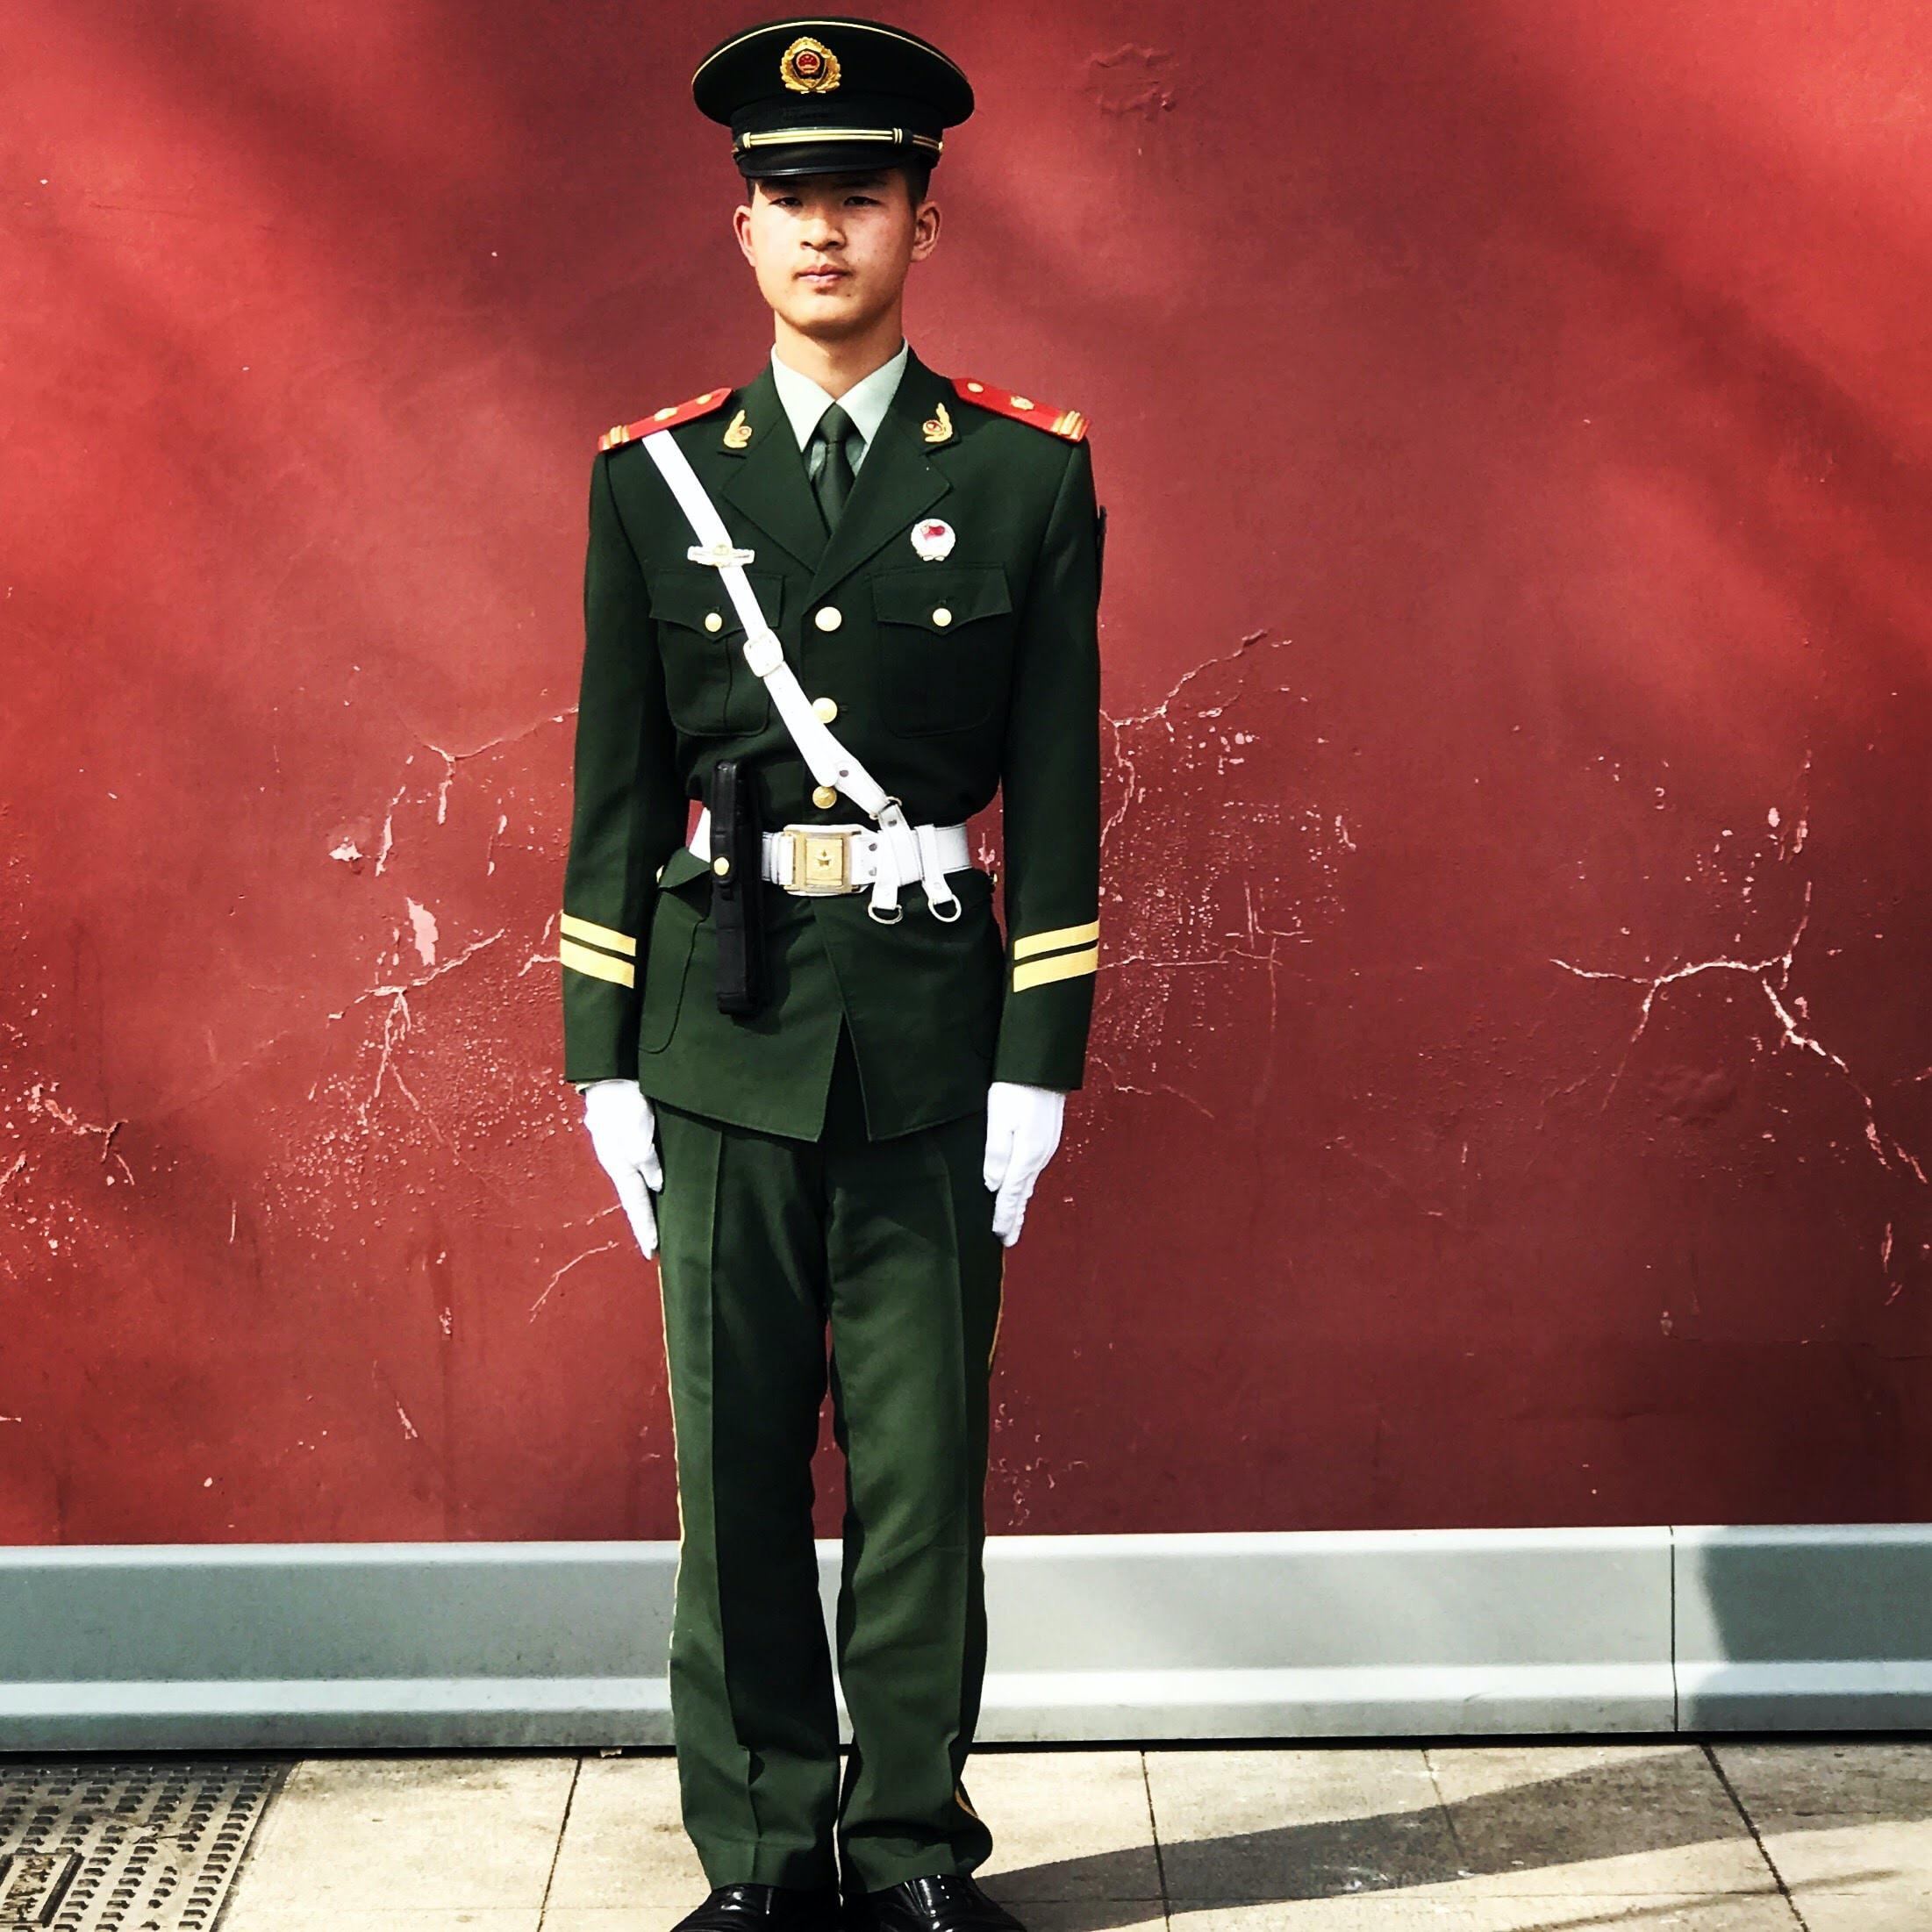 man standing near red wall